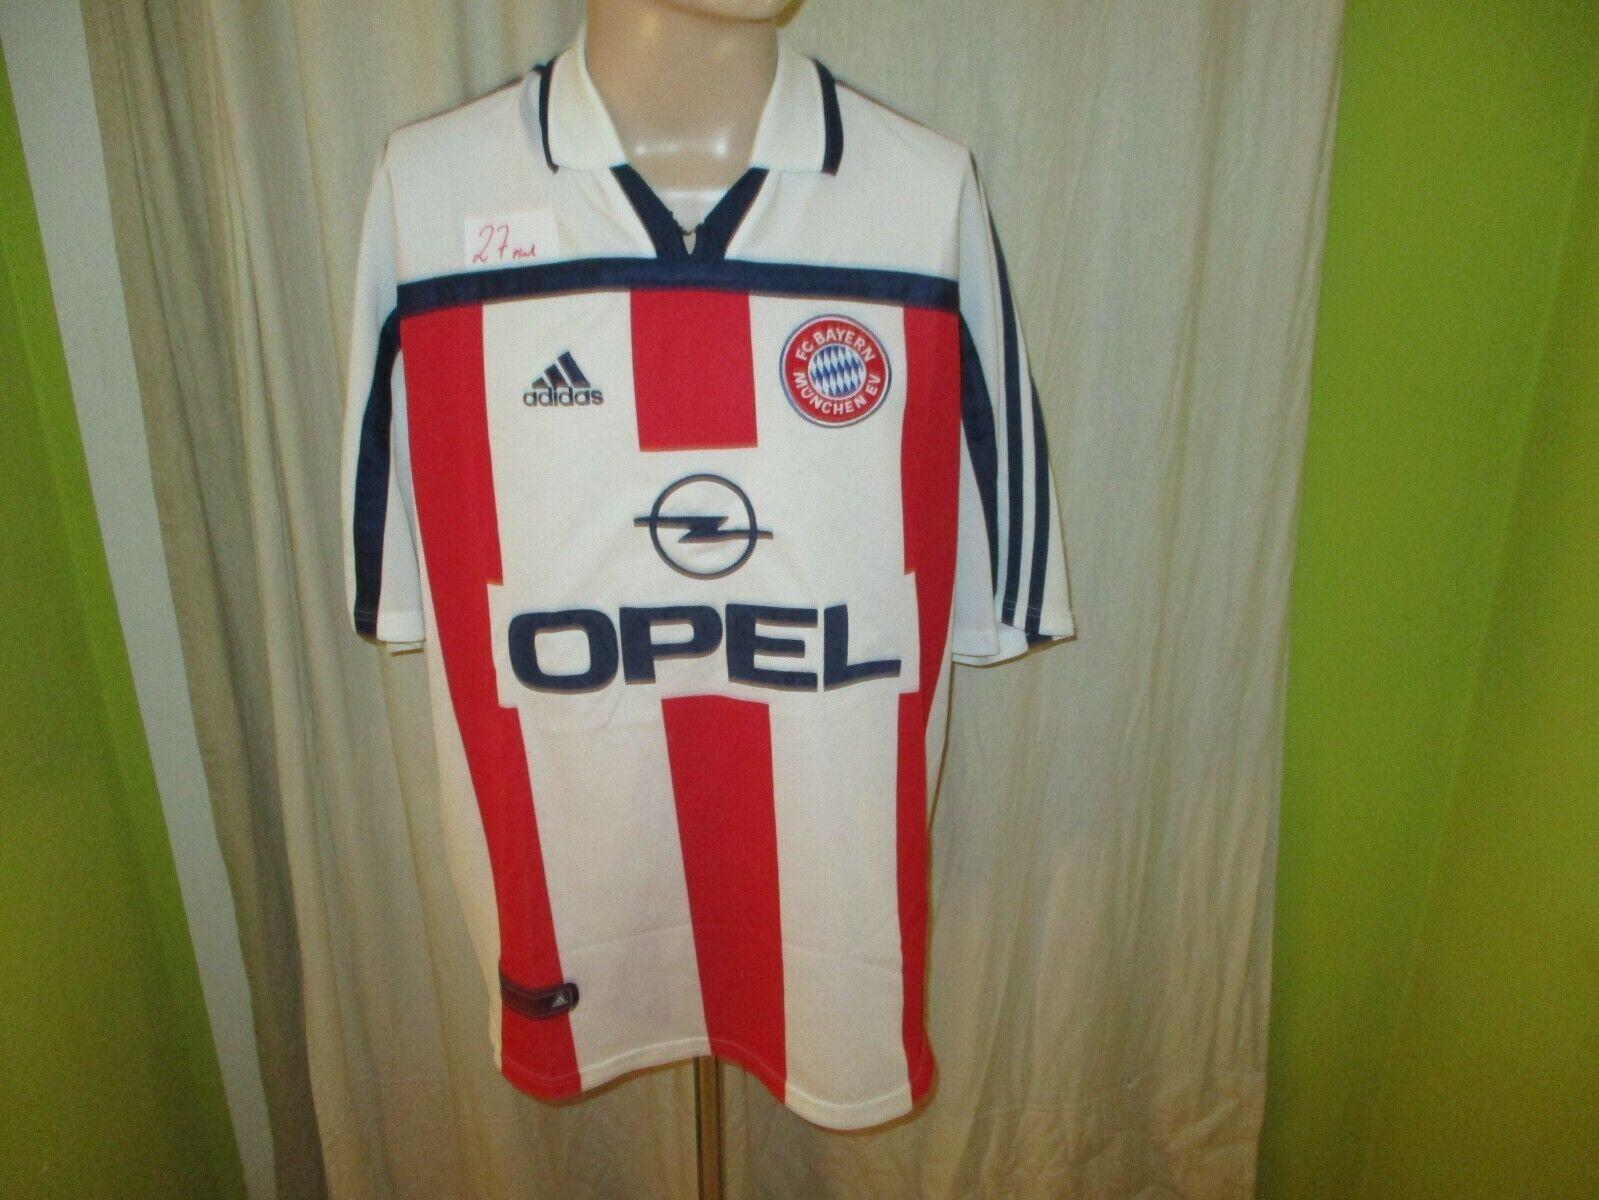 FC Bayern München Original Adidas Auswärts Trikot 2000-2002  OPEL  Gr.XXL  | Neues Produkt